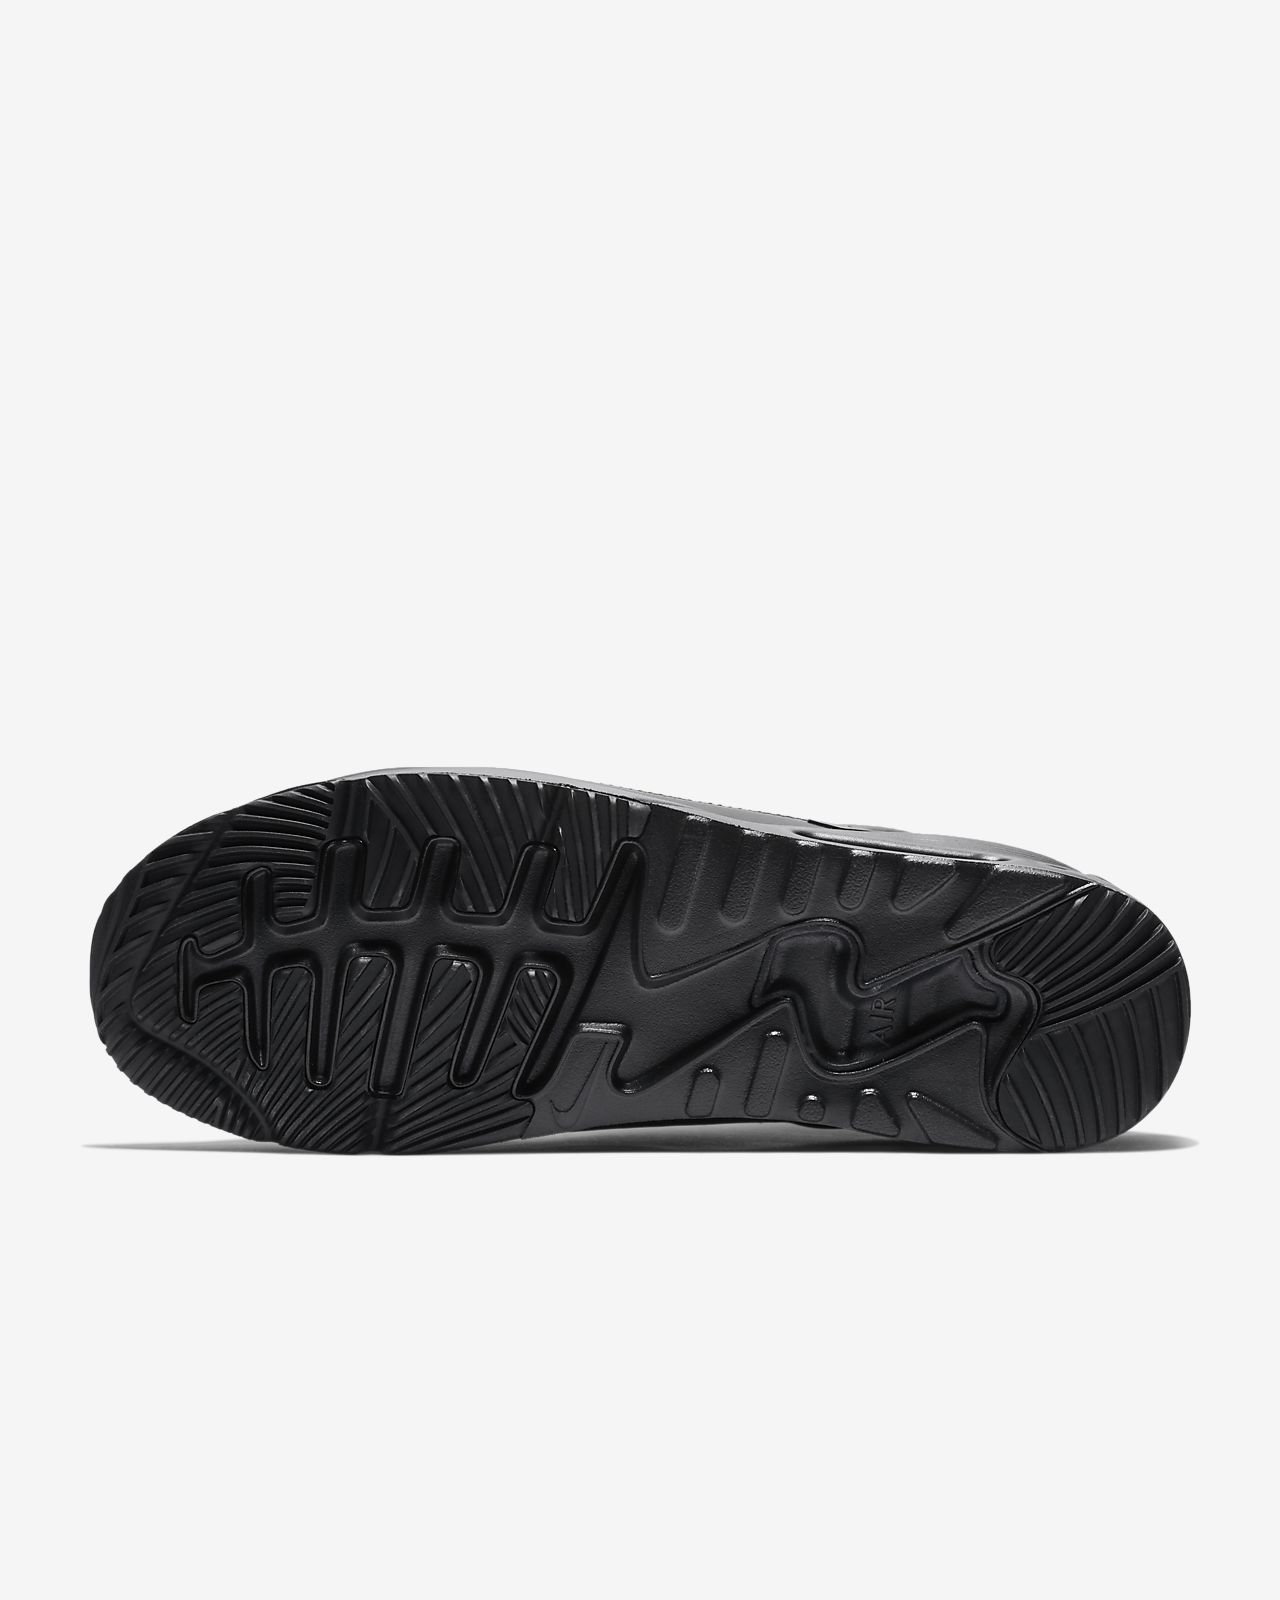 Nike Air Max 90 Ultra Mid Winter Men's Shoe